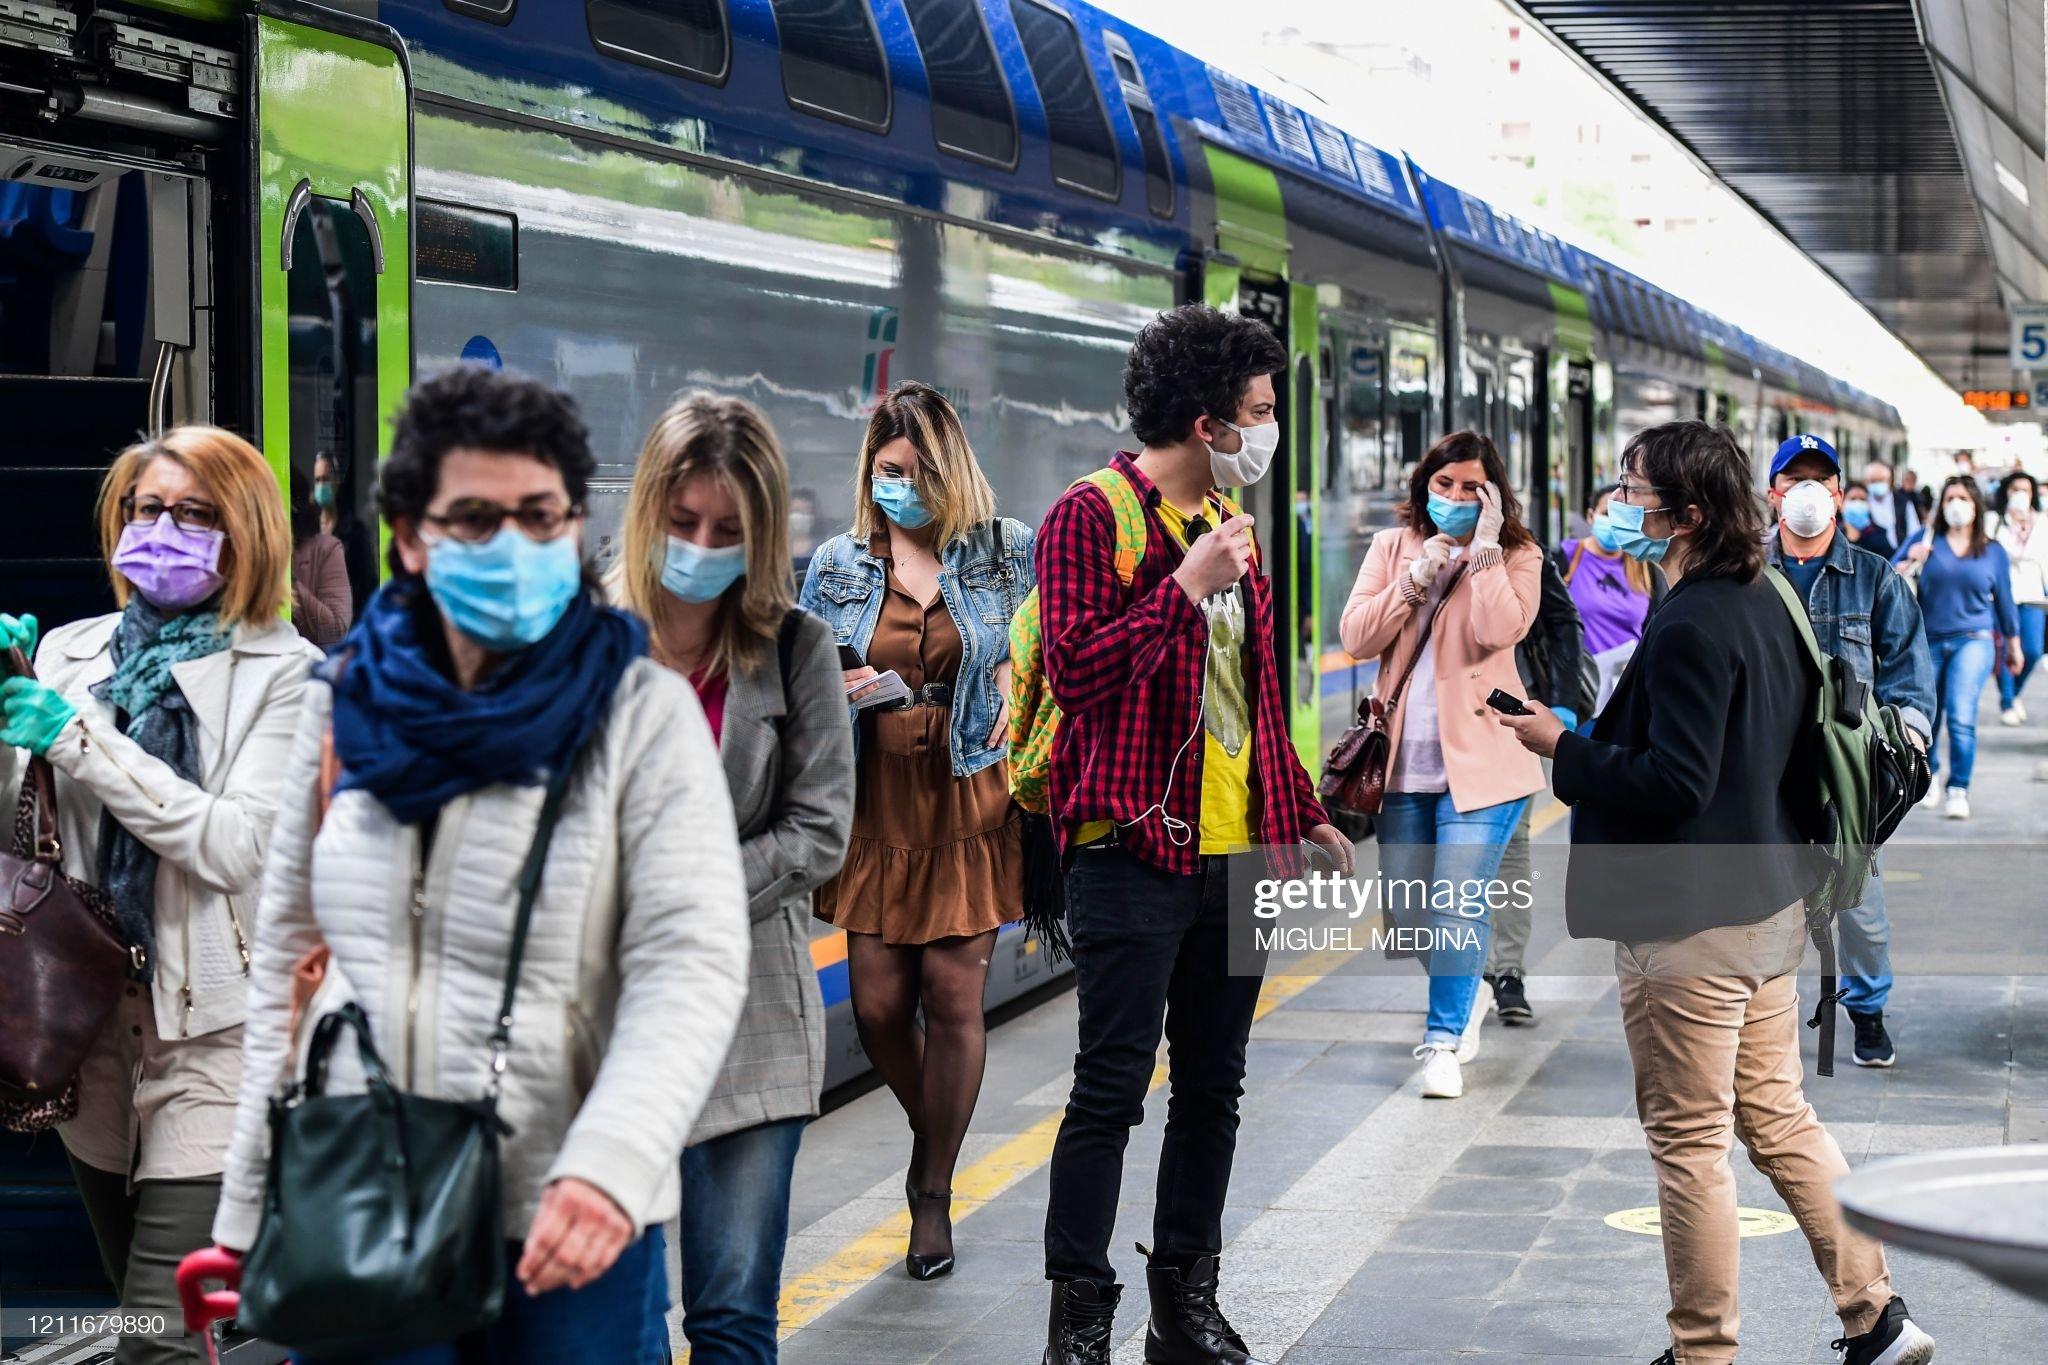 Herd Immunity: Crowd wearing masks inside train station, Ita